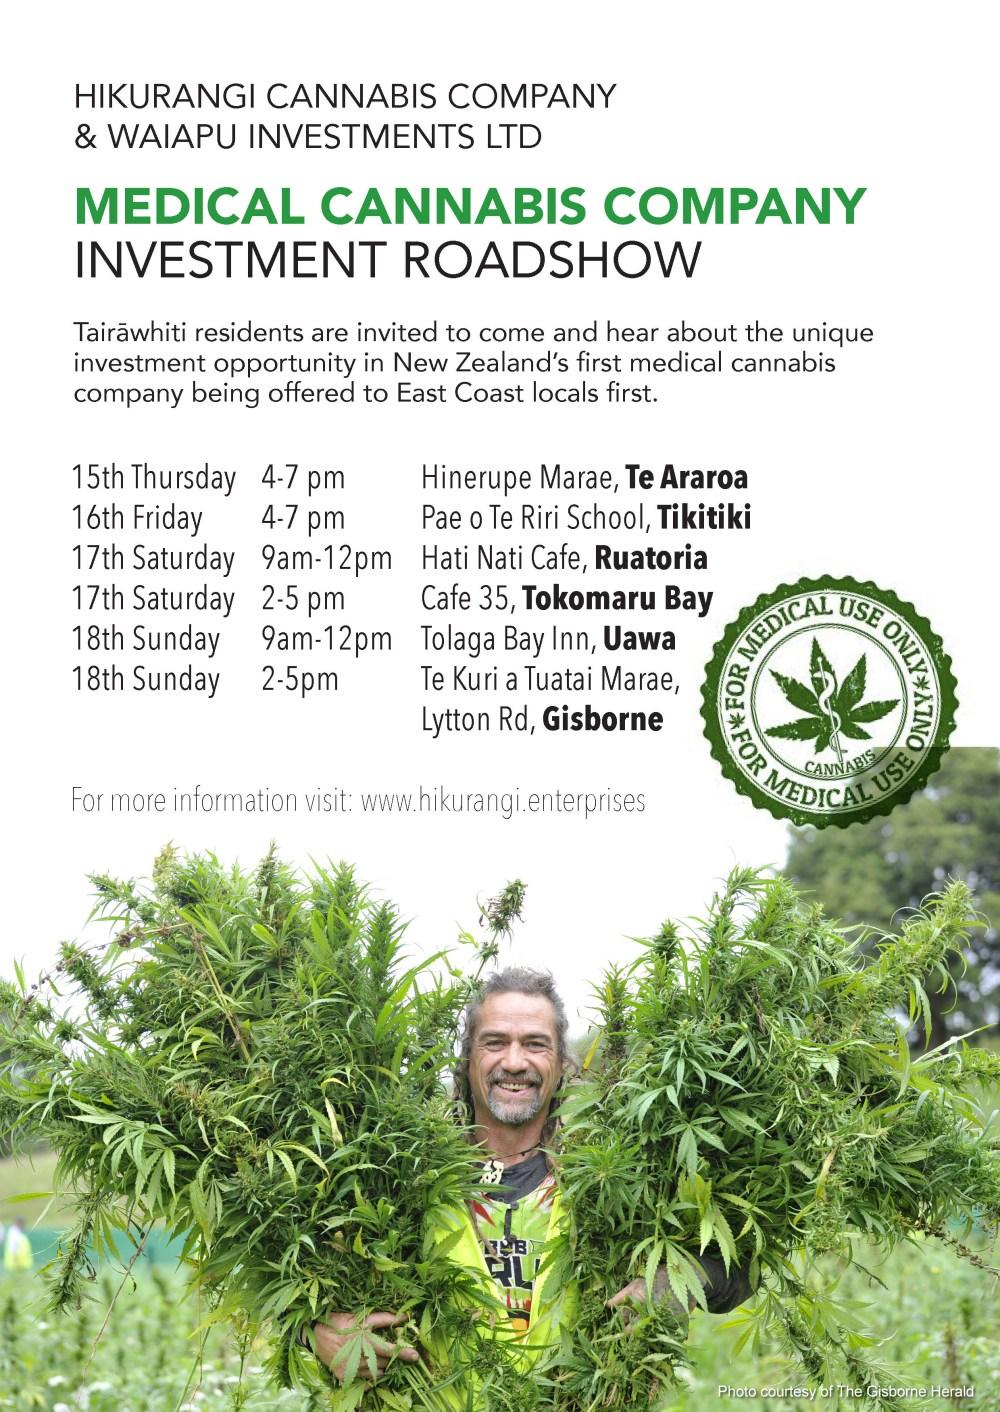 Roadshow Poster